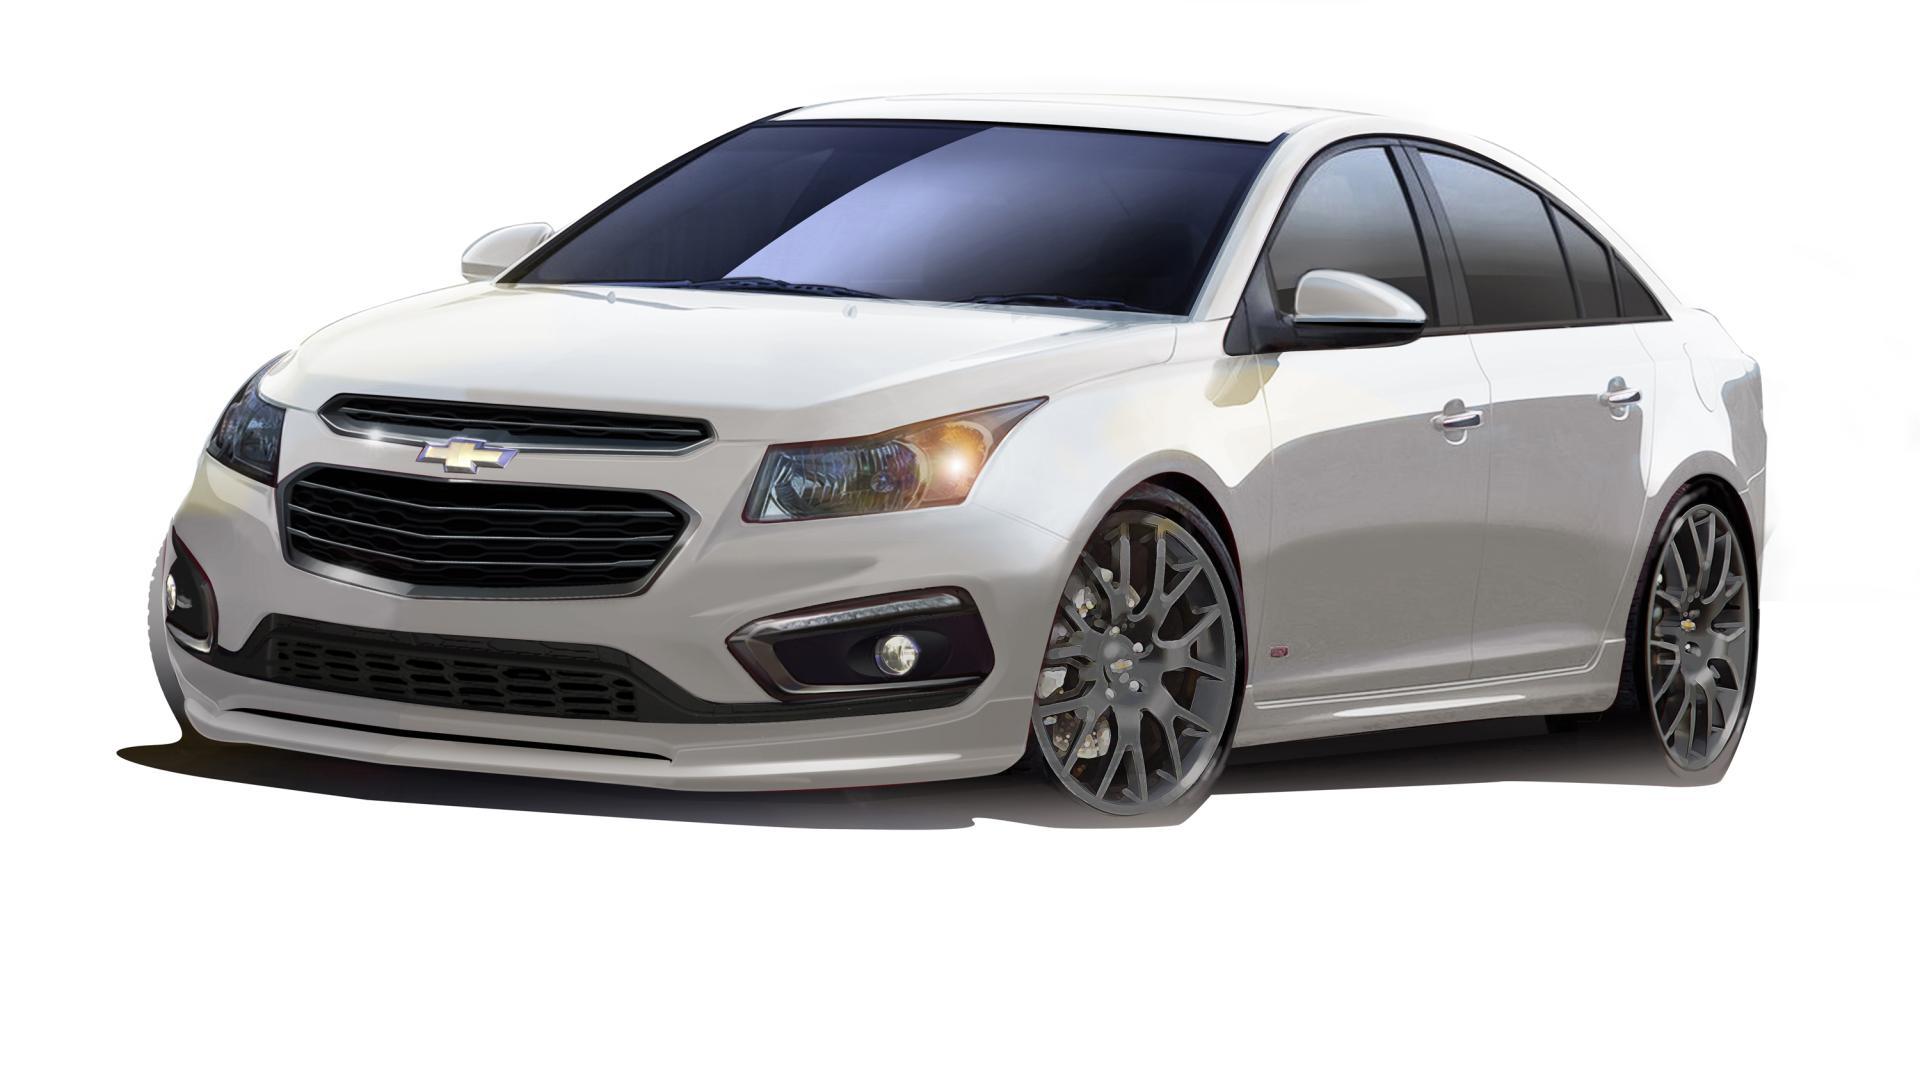 2014 Chevrolet Personalization Cruze Diesel Concept News